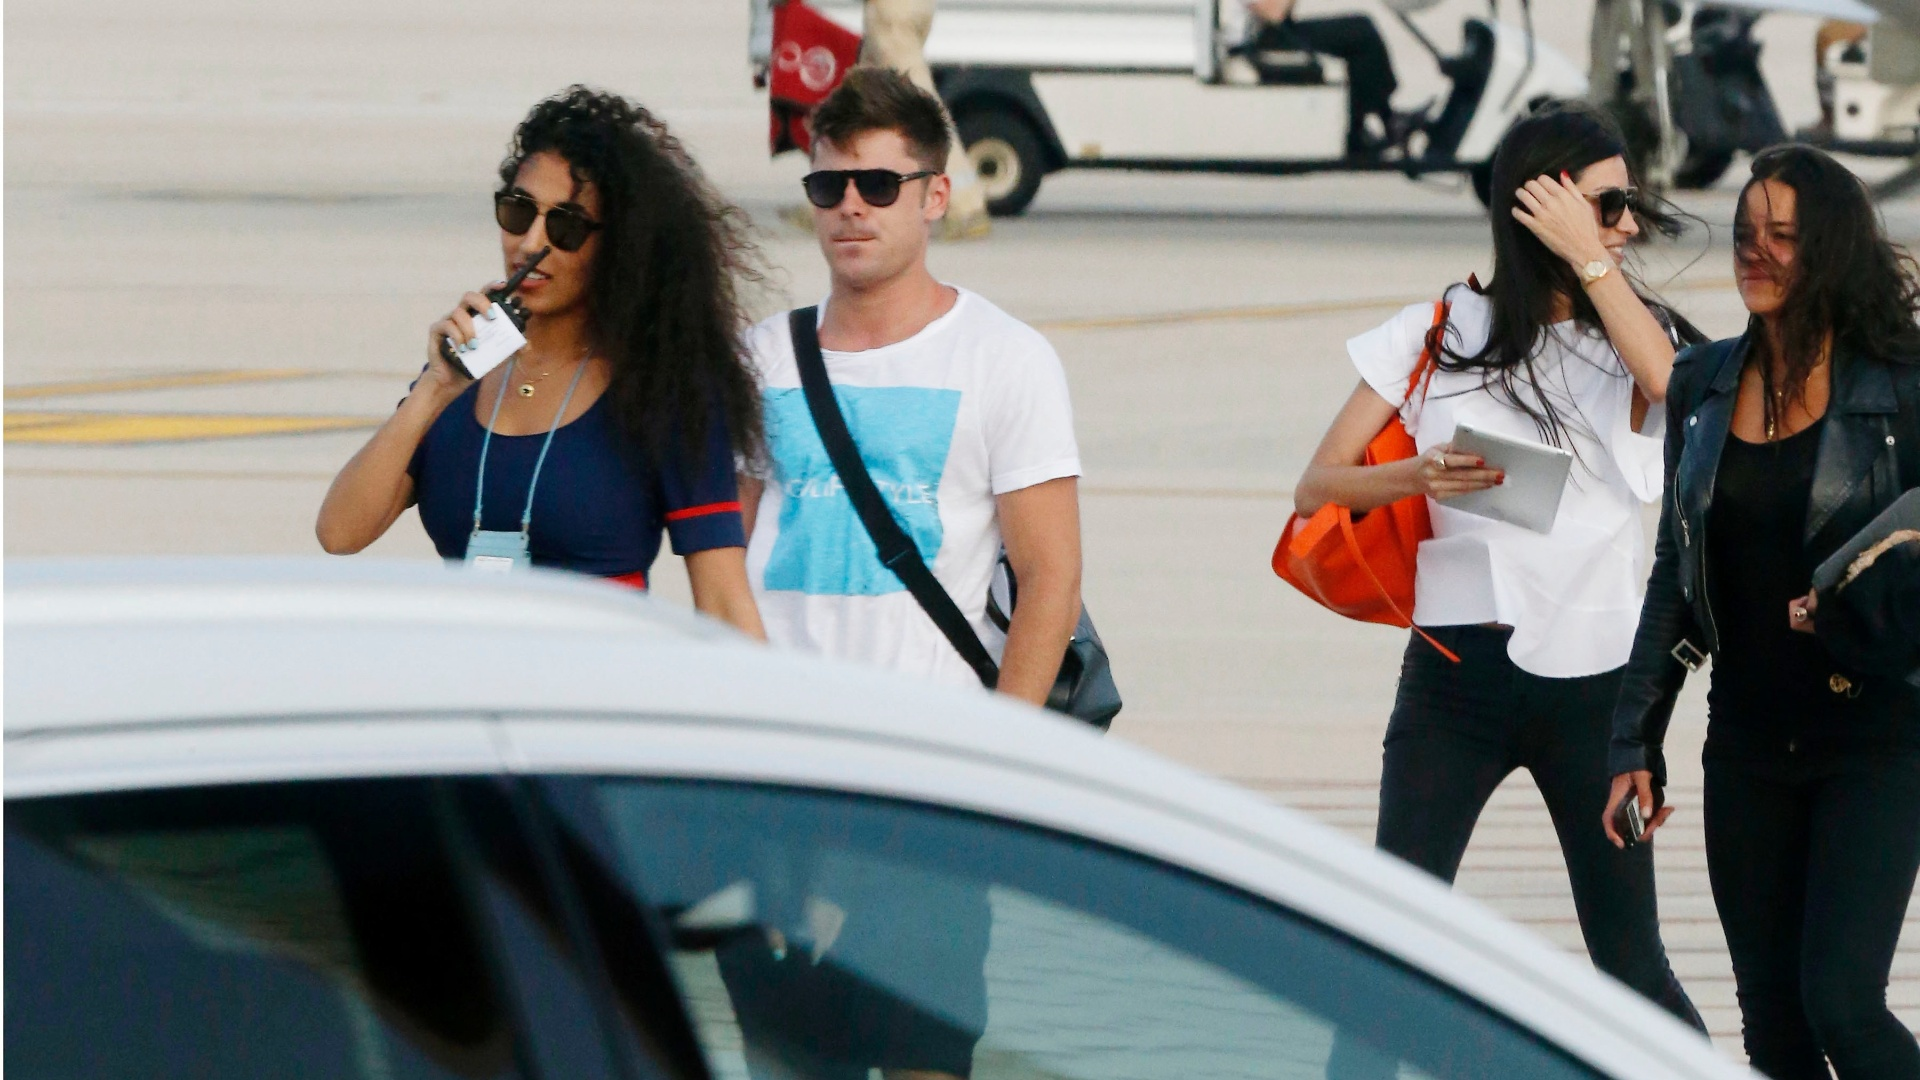 3.jul.2014 - Zac Efron e Michelle Rodriguez (à direita, de preto) desembarcam na Sardenha, na Itália